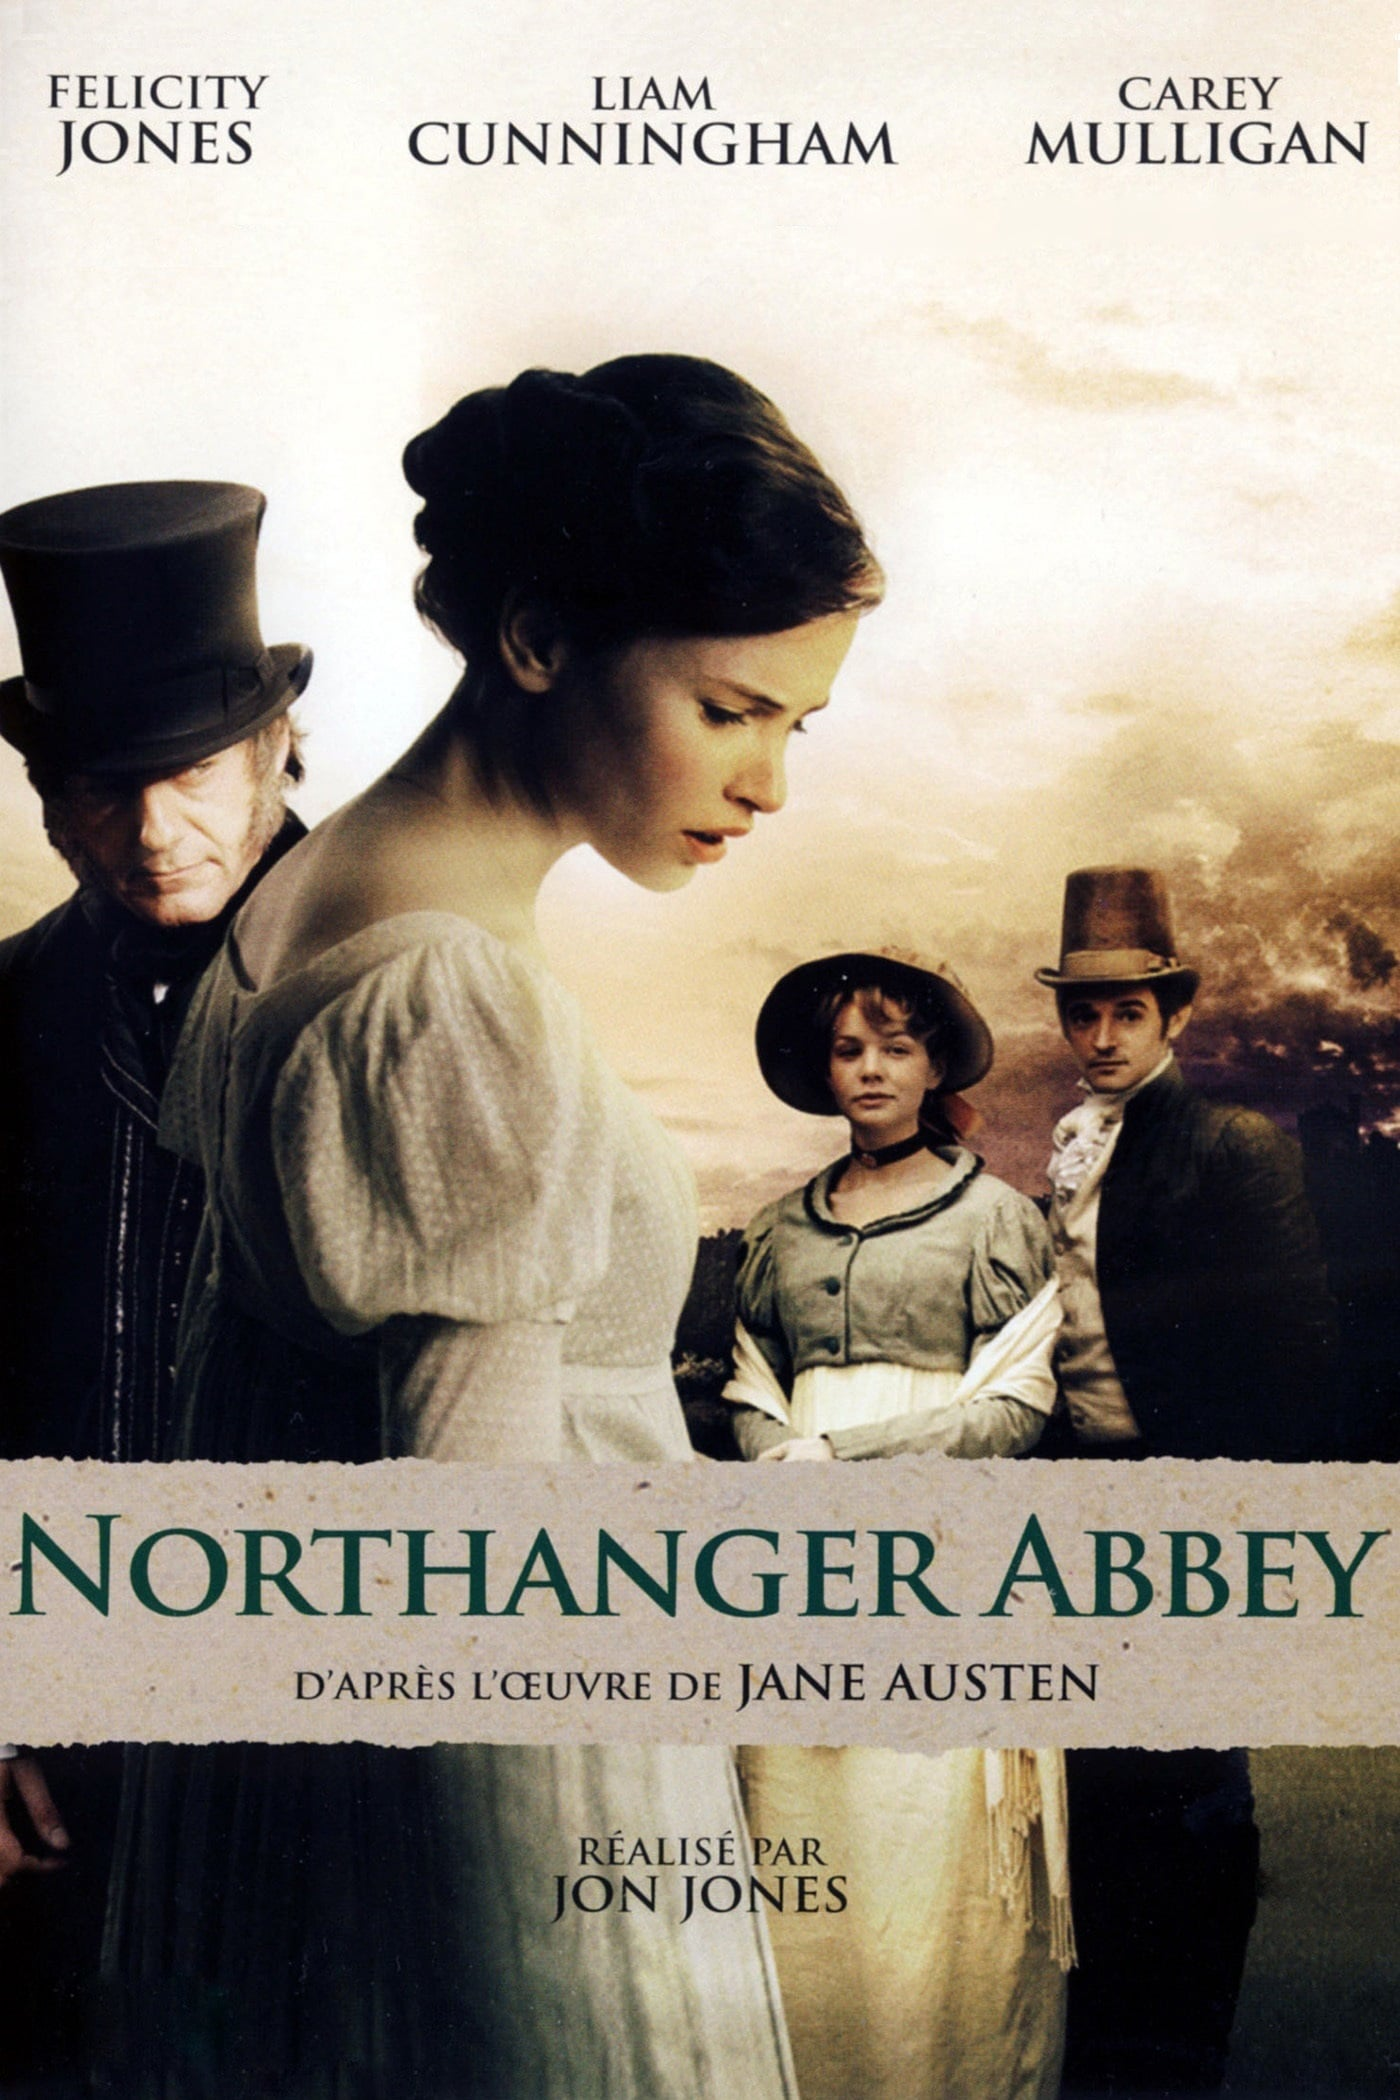 affiche du film Northanger Abbey (TV)